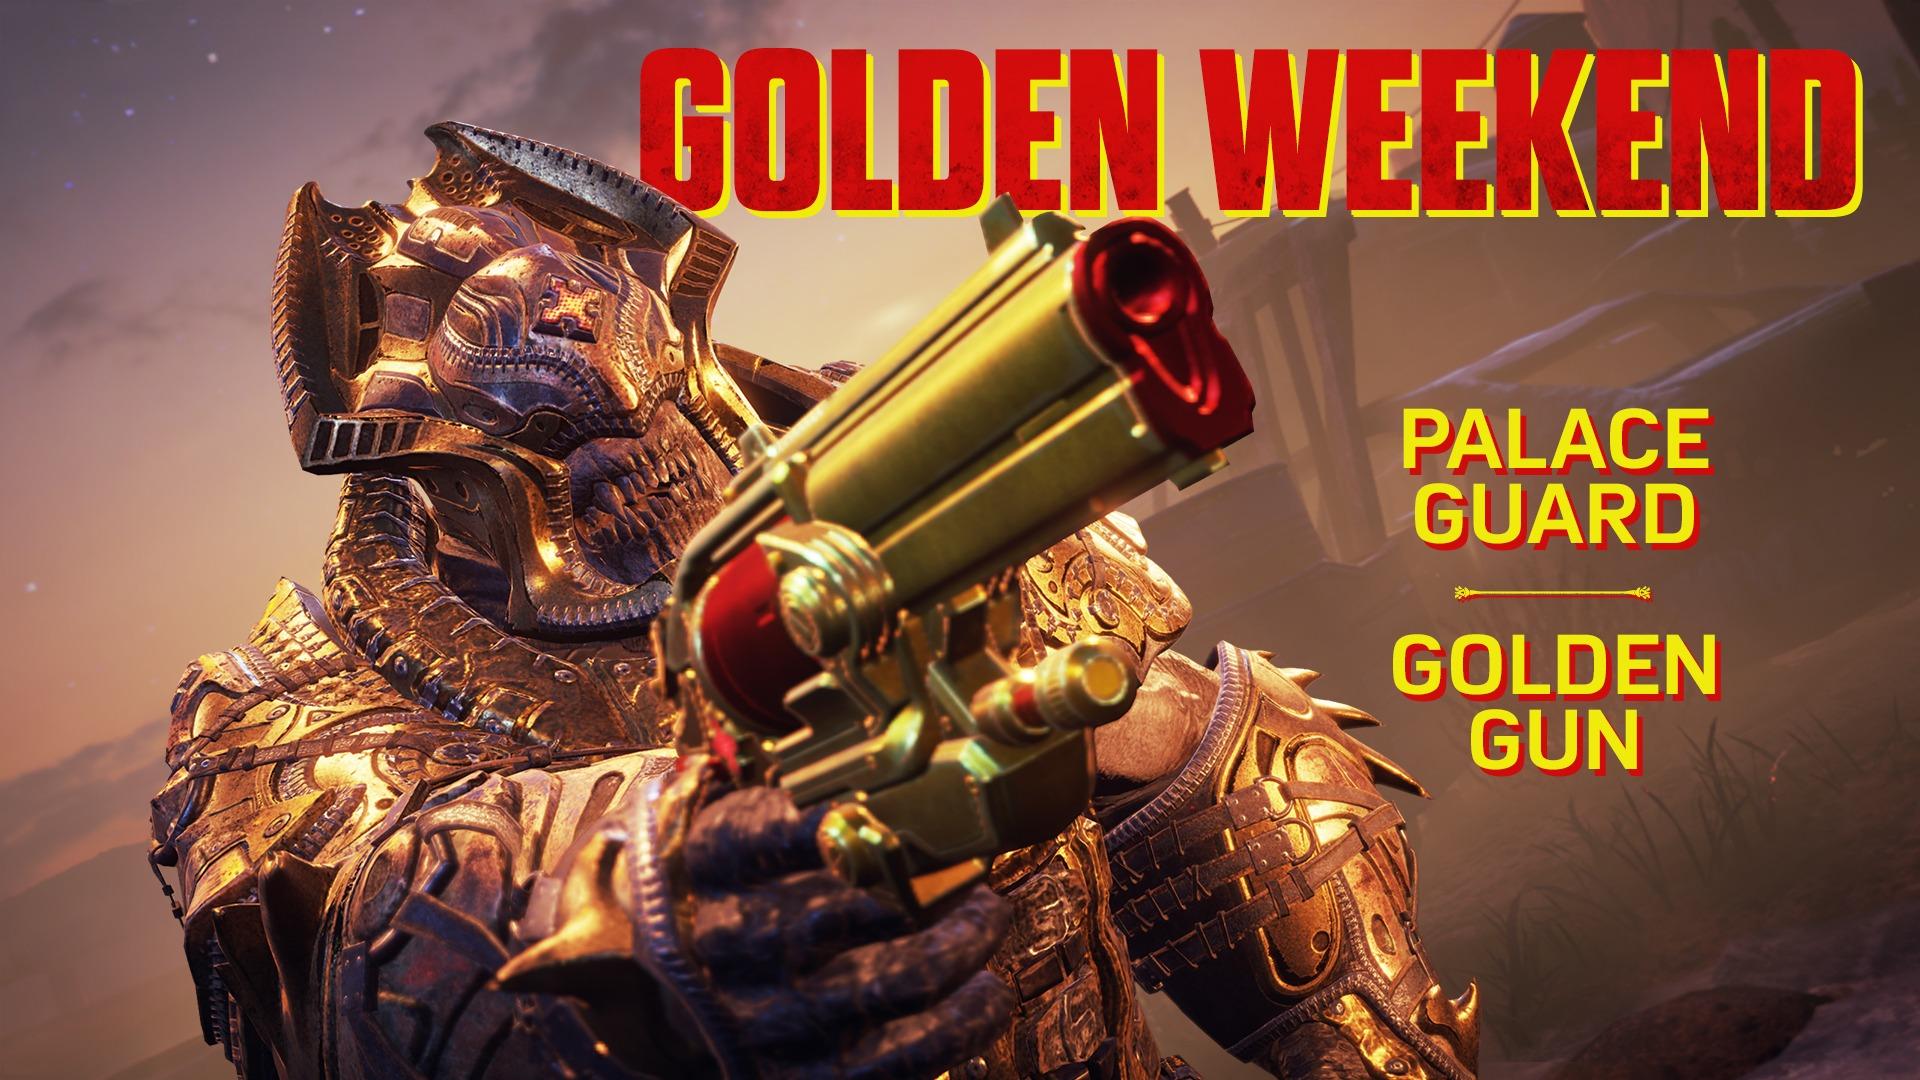 Golden Gun returns, Summer of Gears, skin challenges & more